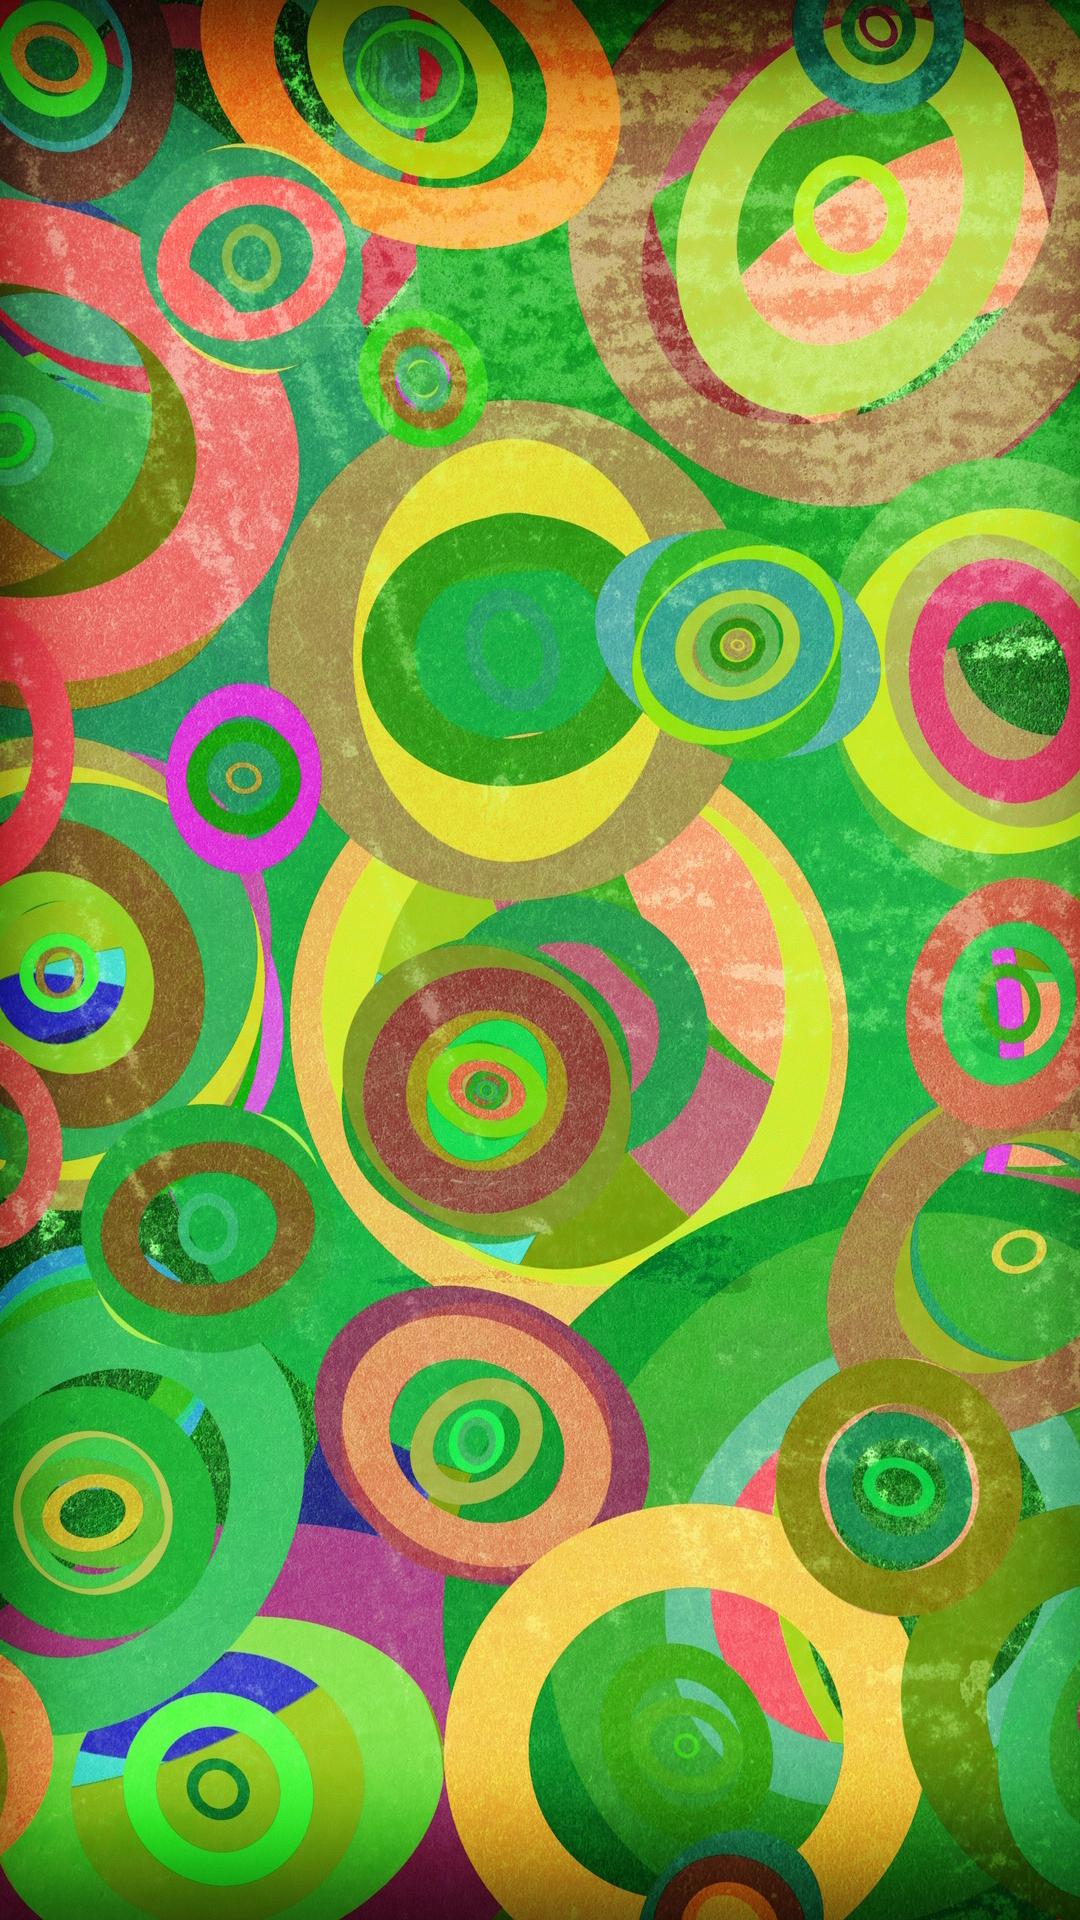 Wallpapers for galaxy colorful circular pattern colorful circles wallpaper for galaxy s4 in 1080x1920 resolution voltagebd Gallery